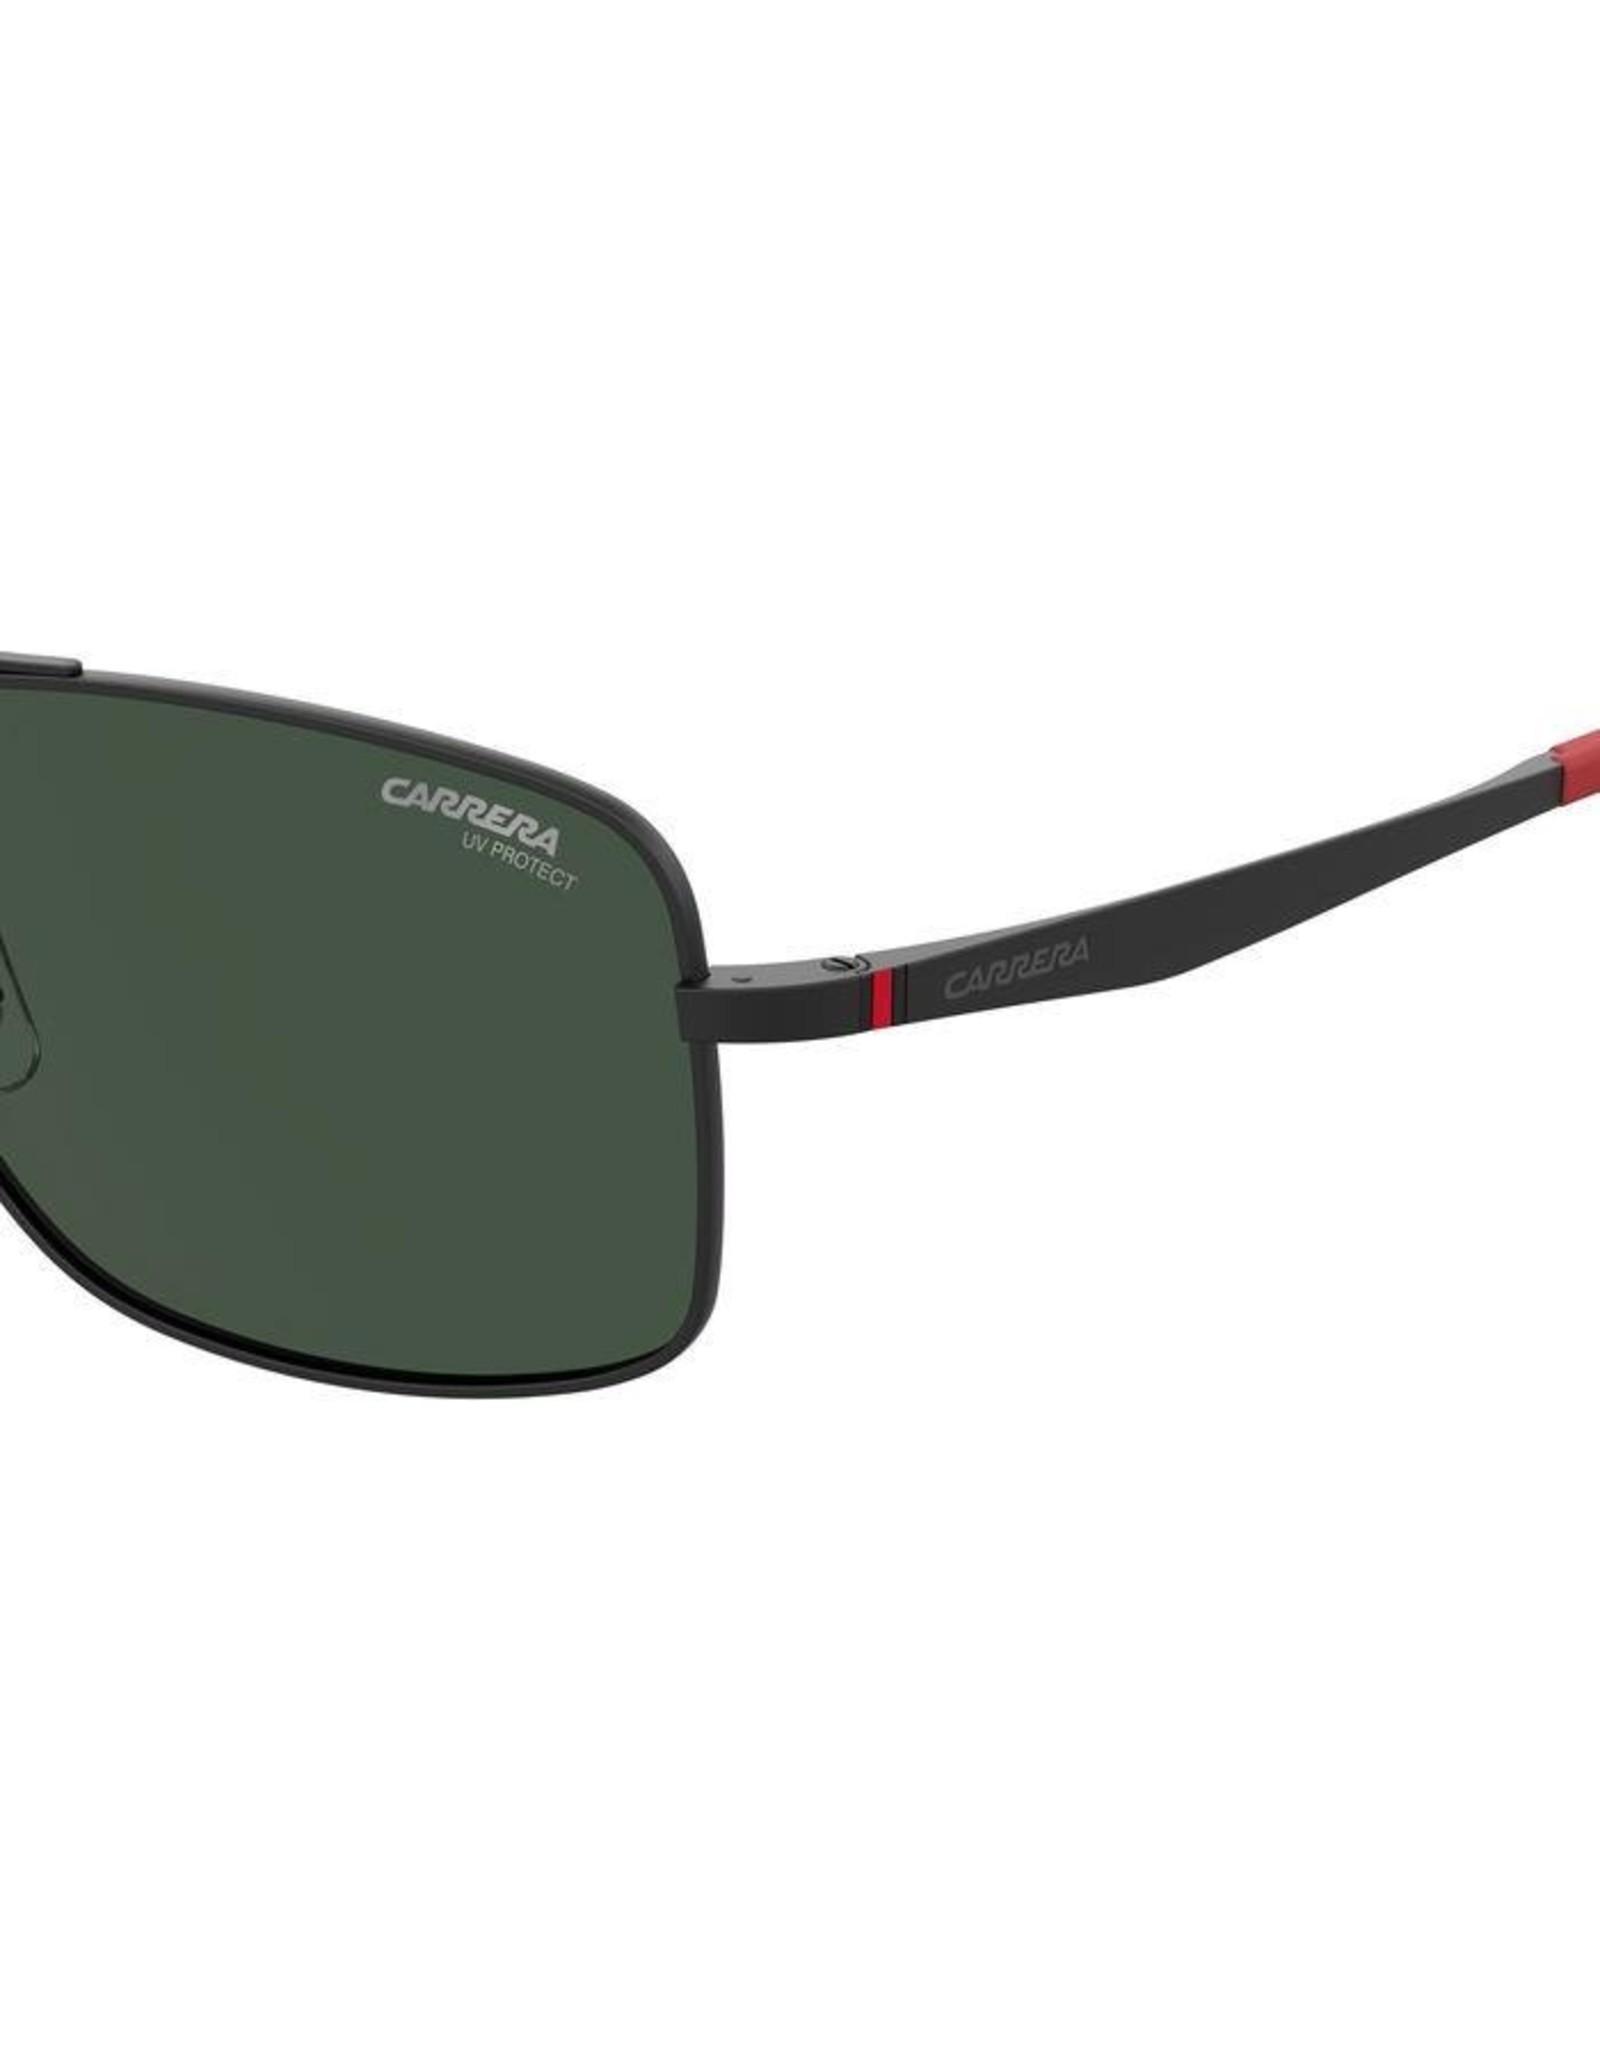 Carrera Carrera - 8040/S - 003